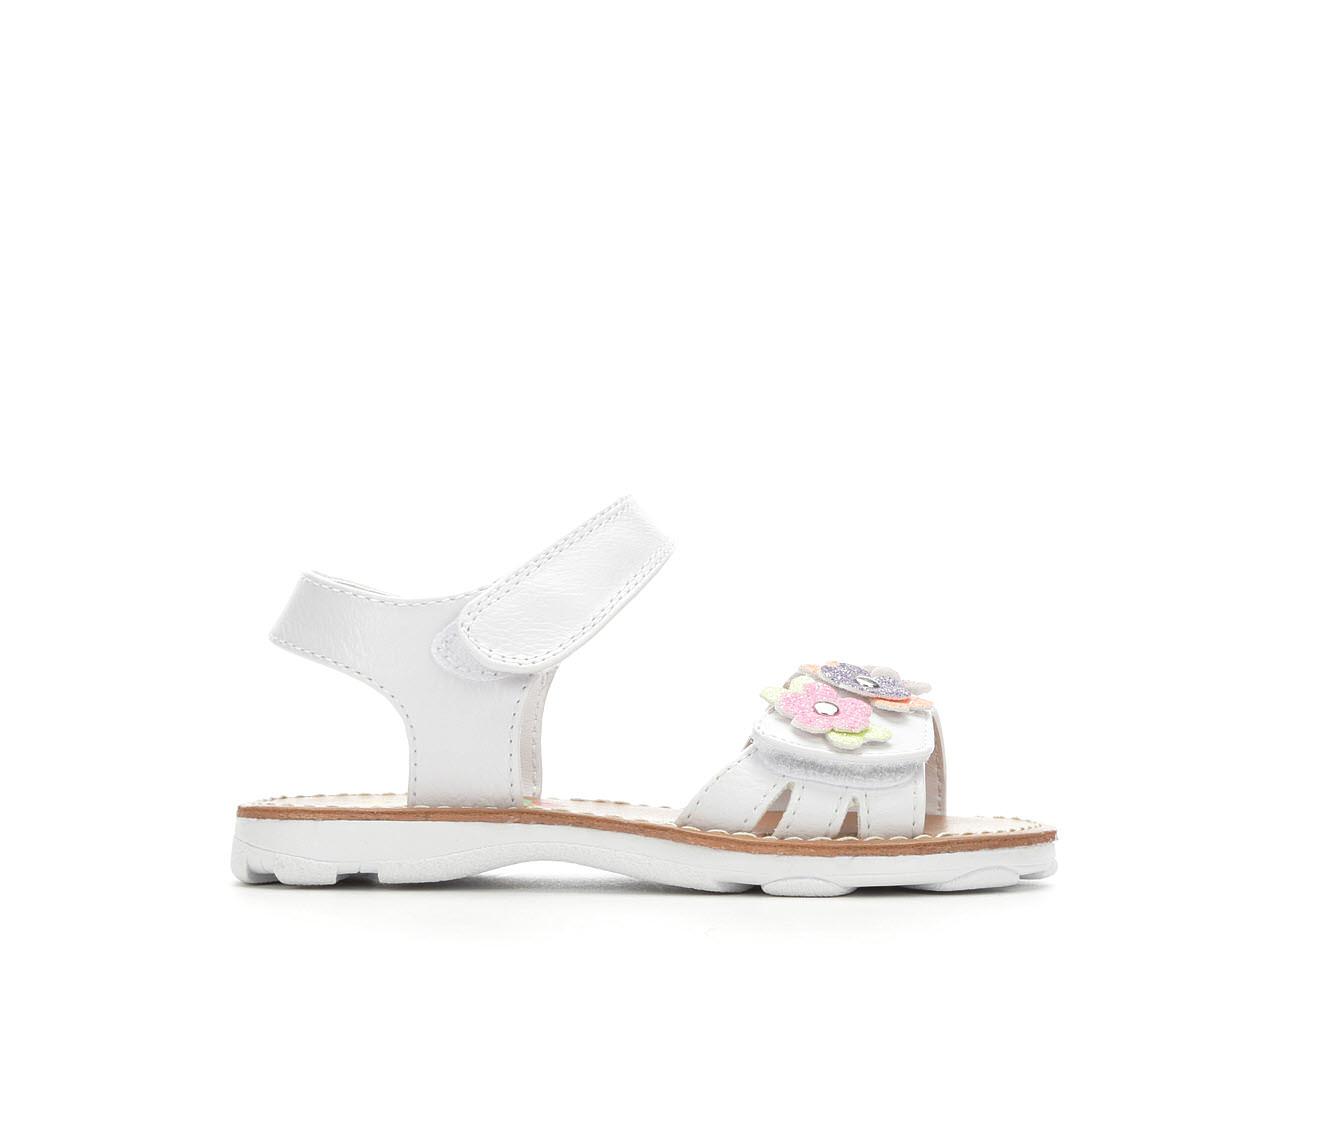 Rachel Shoes Lil Mariah 5-12 Children's Shoe (White - Size 7 - Toddler)